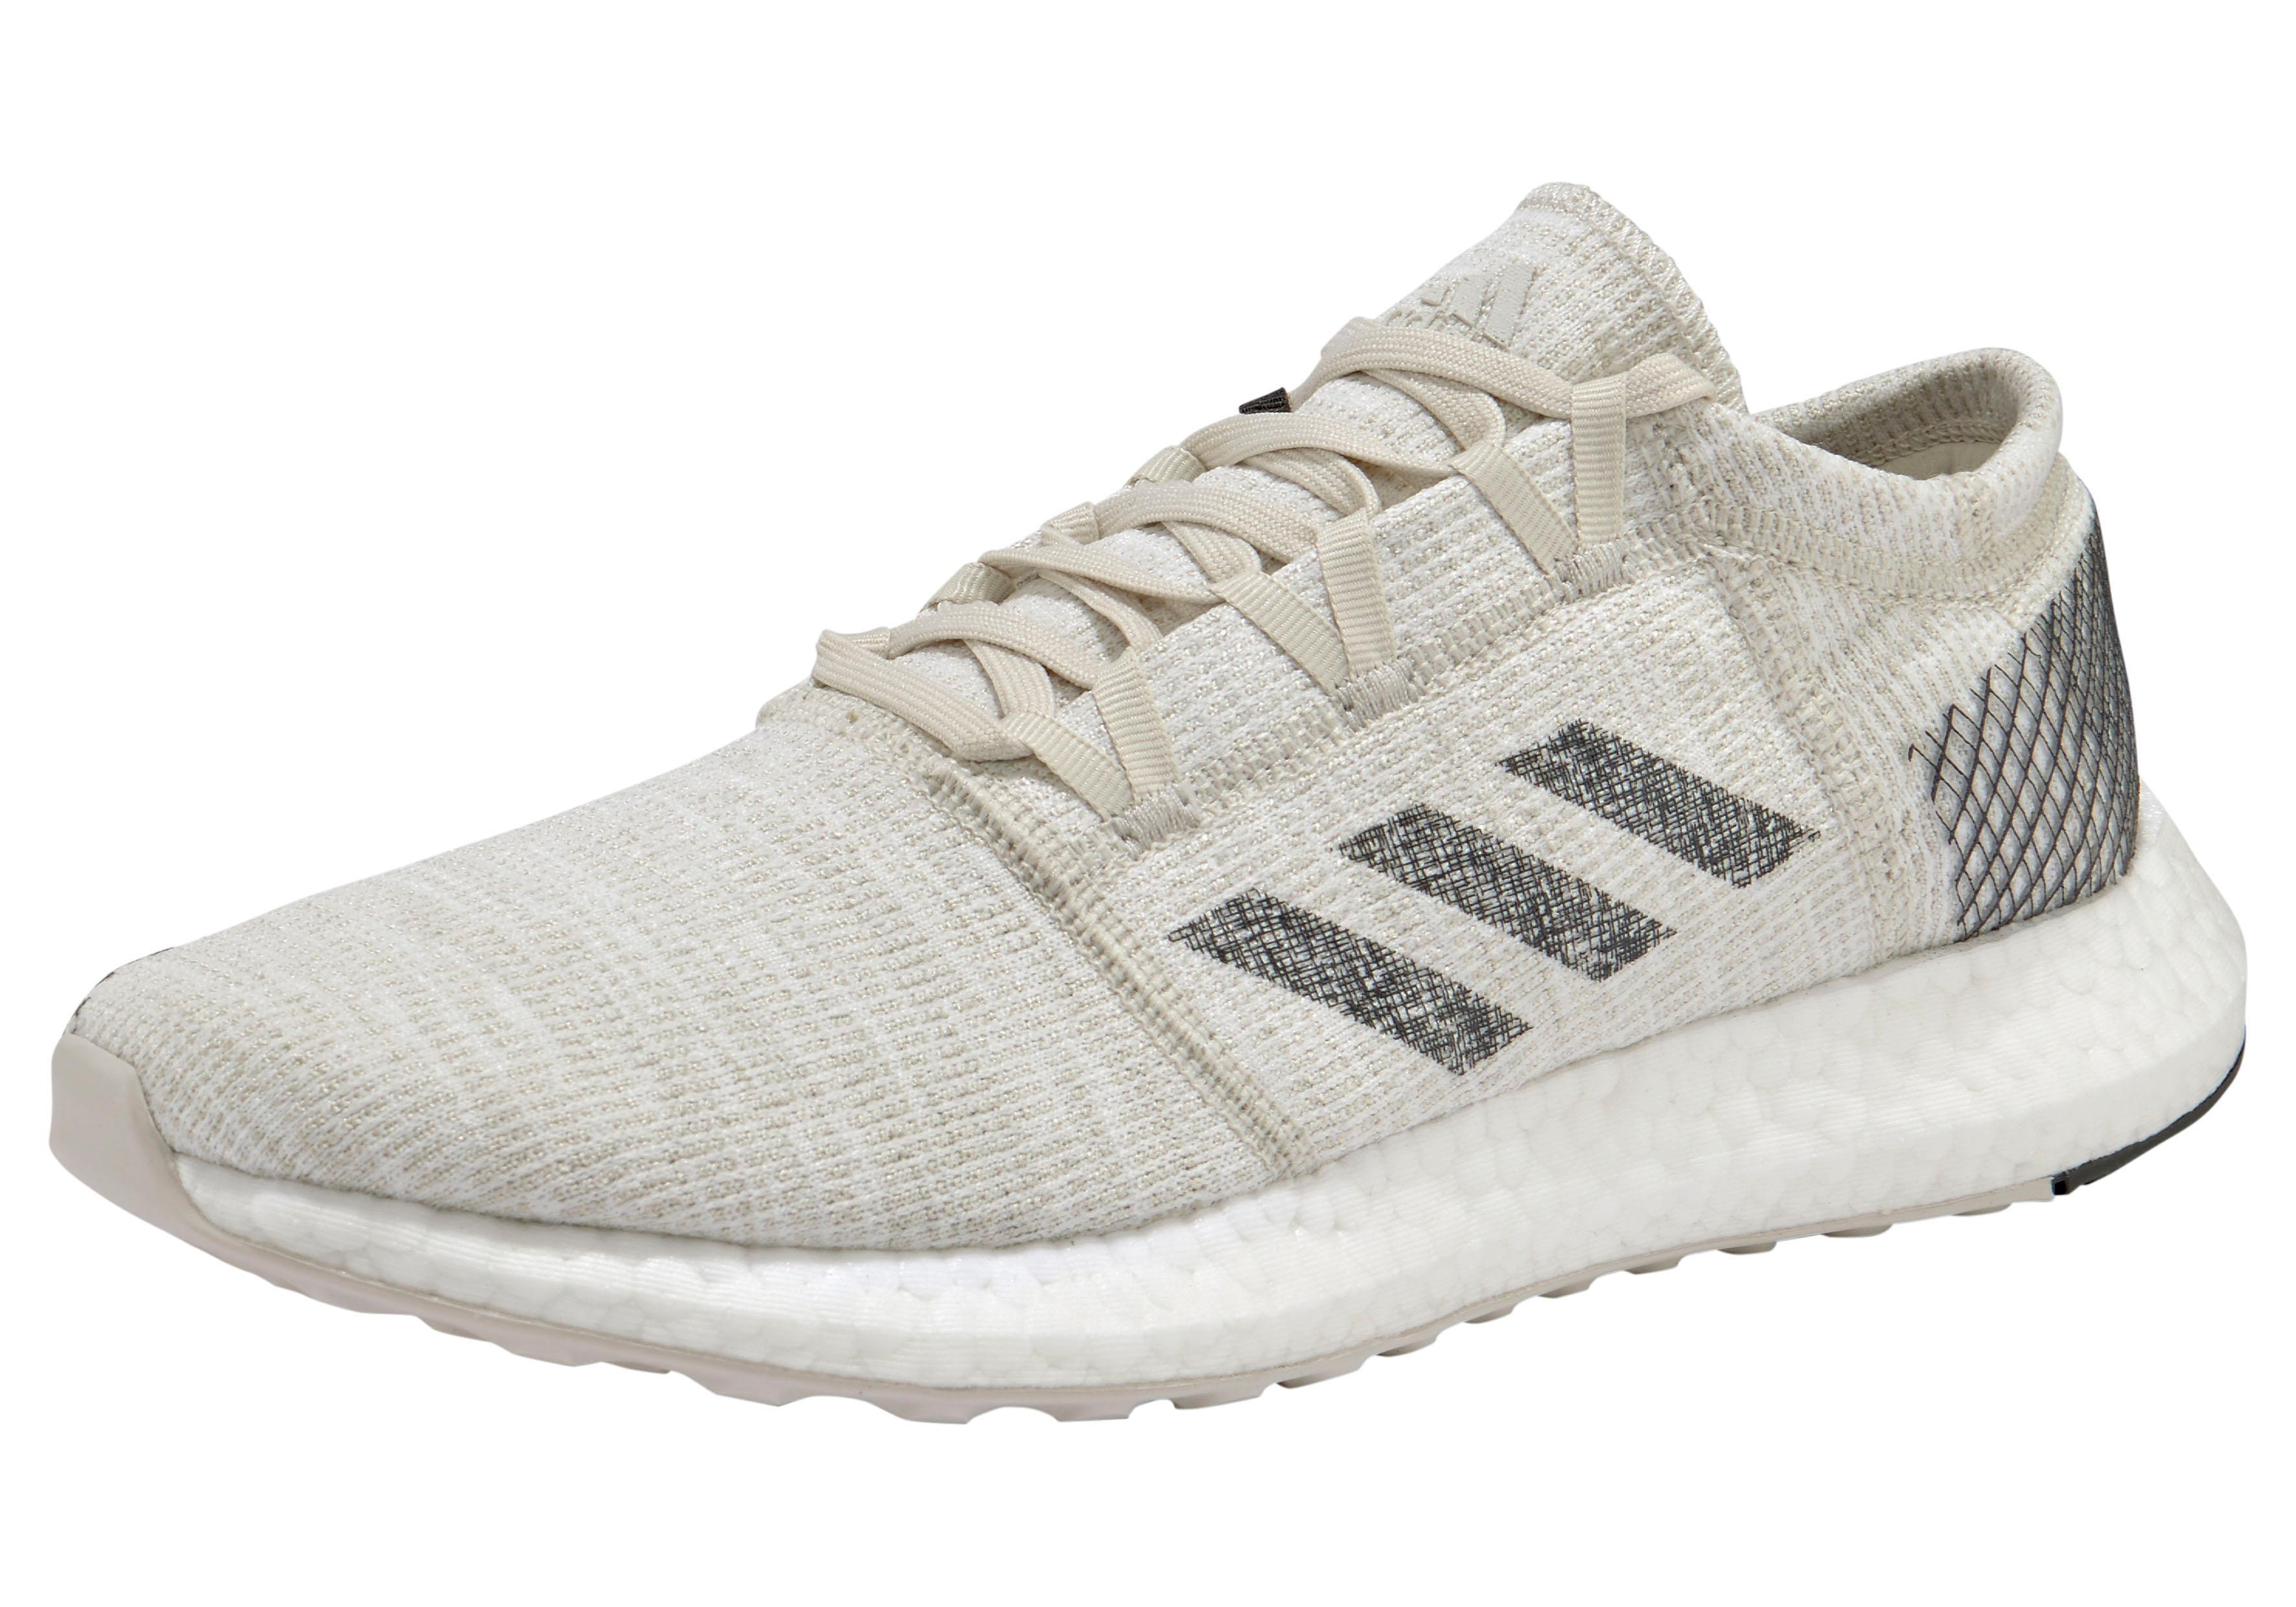 adidas Performance Laufschuh Pure Boost Go | Schuhe > Sportschuhe > Laufschuhe | Weiß | Adidas Performance